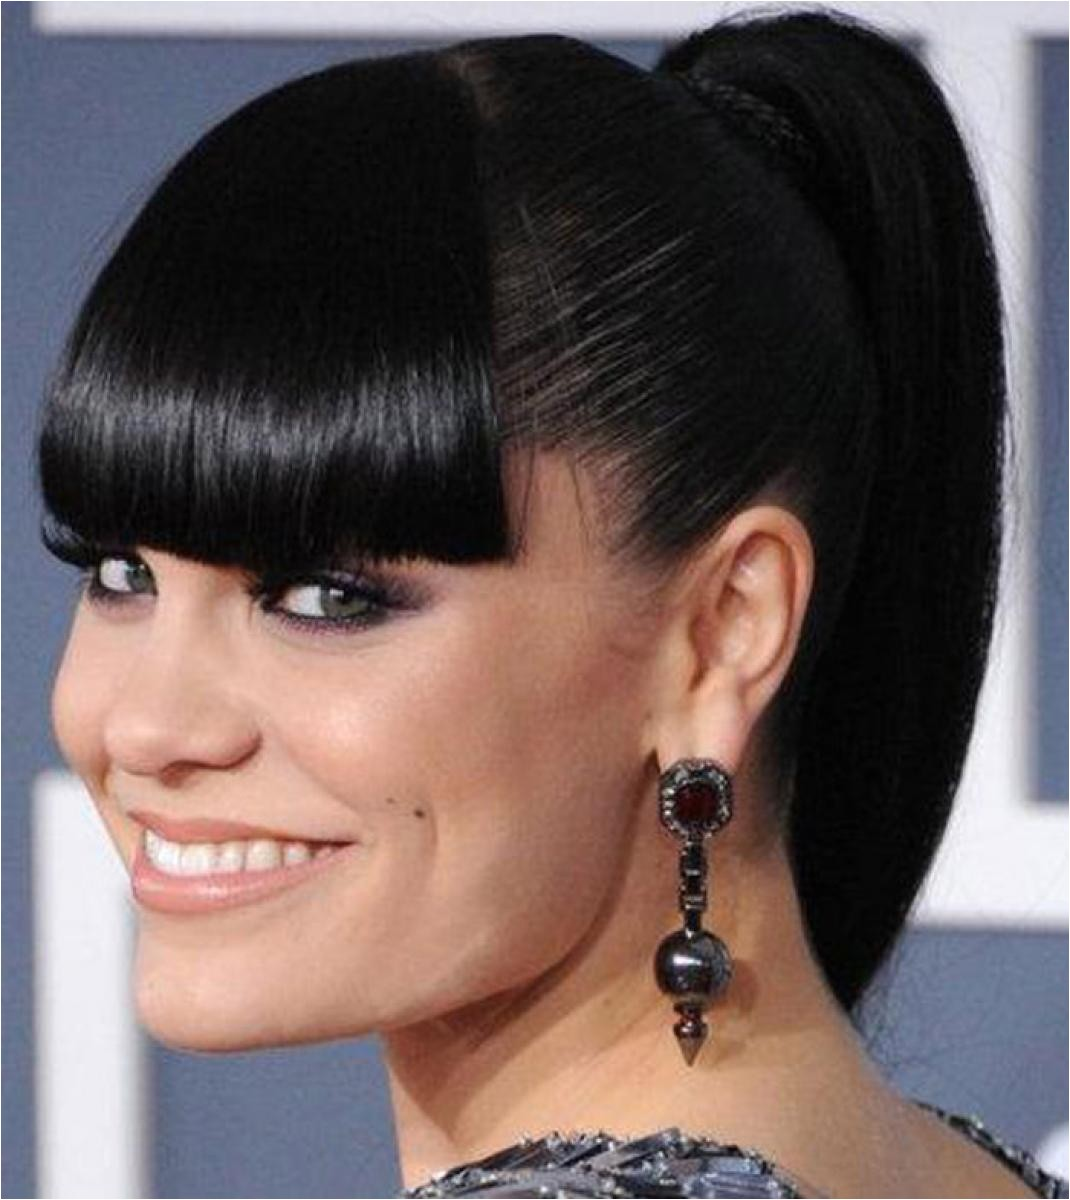 Women Hairstyles Black Ponytail Hairstyles 2013 Black Women